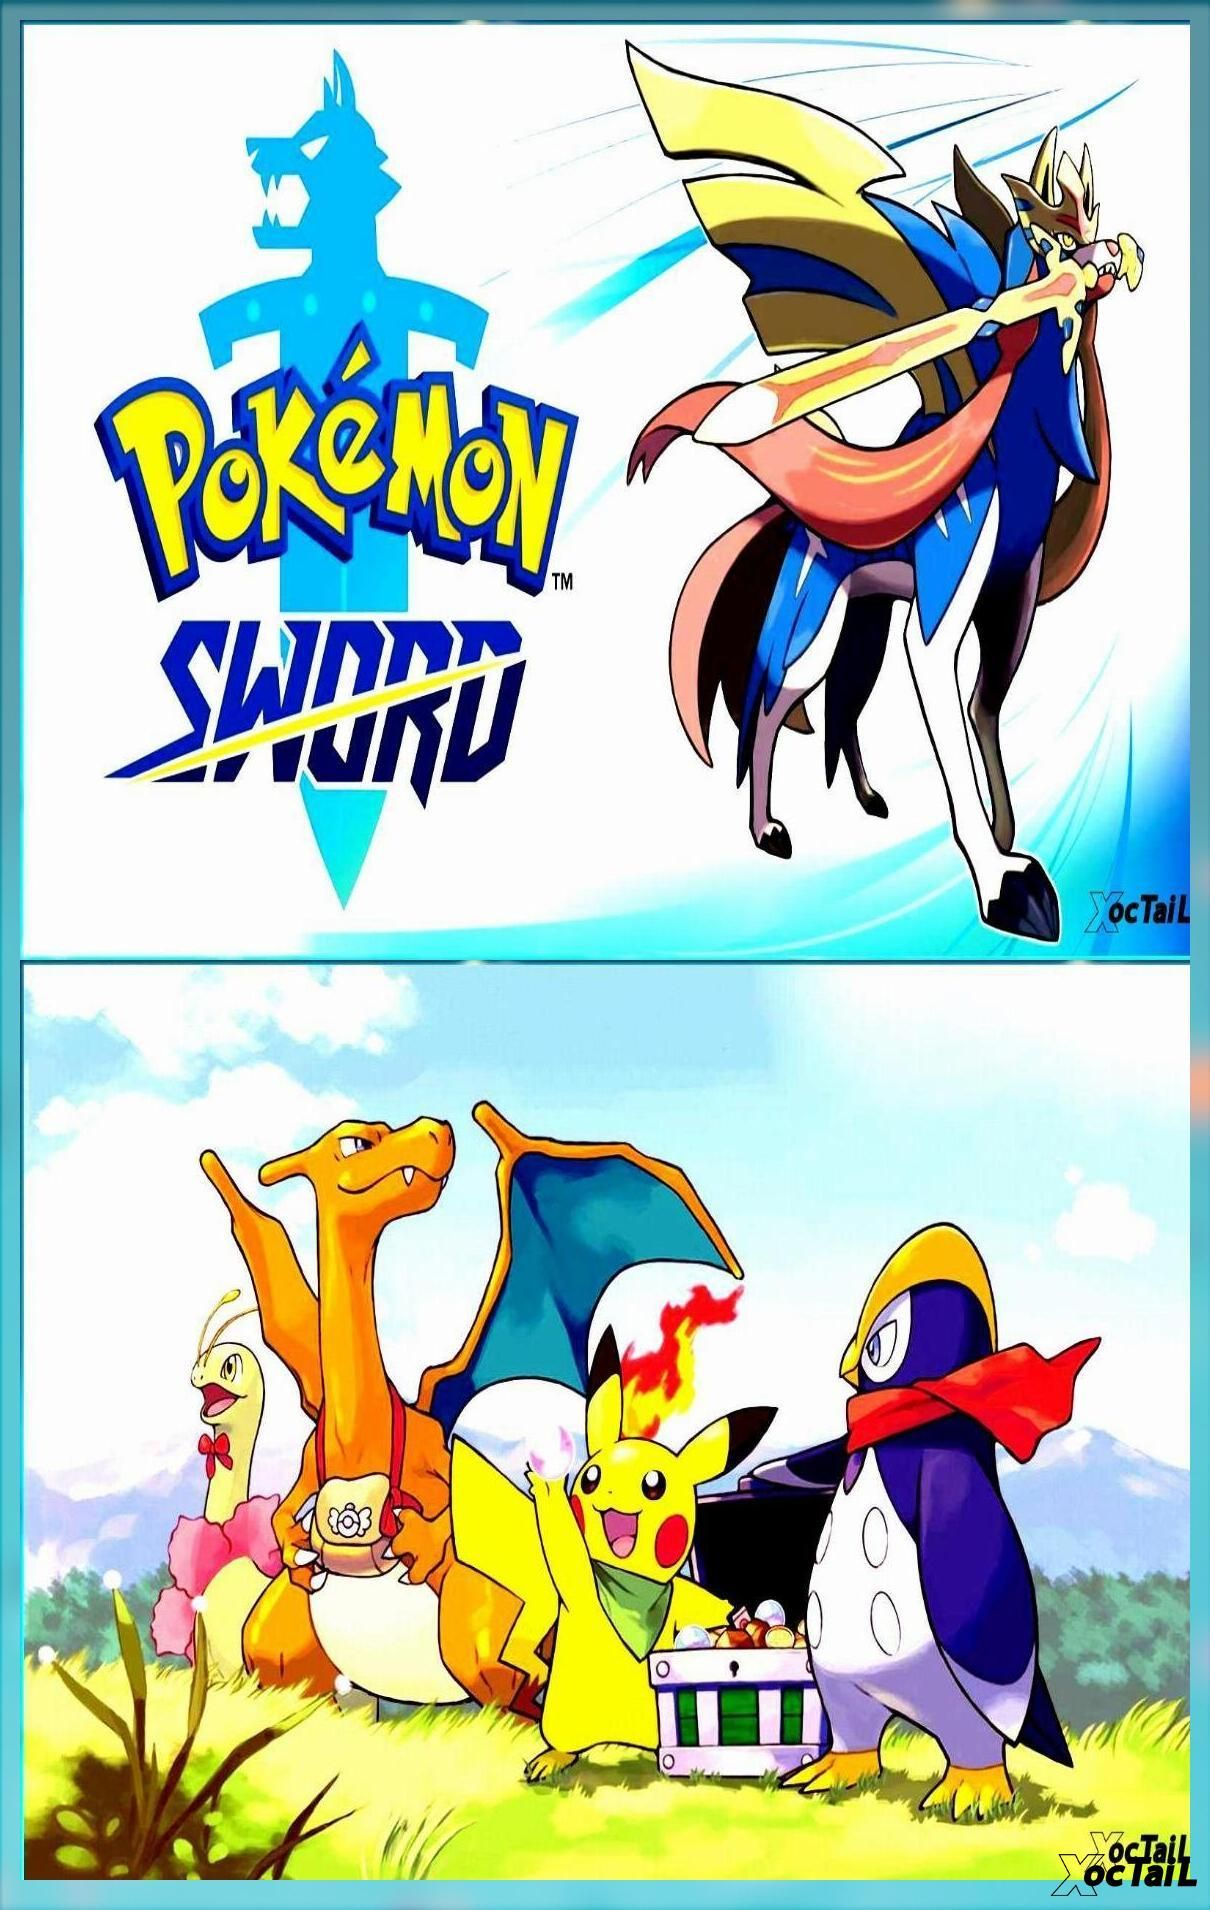 Pokémon Sword Nintendo Switch Games Nintendo